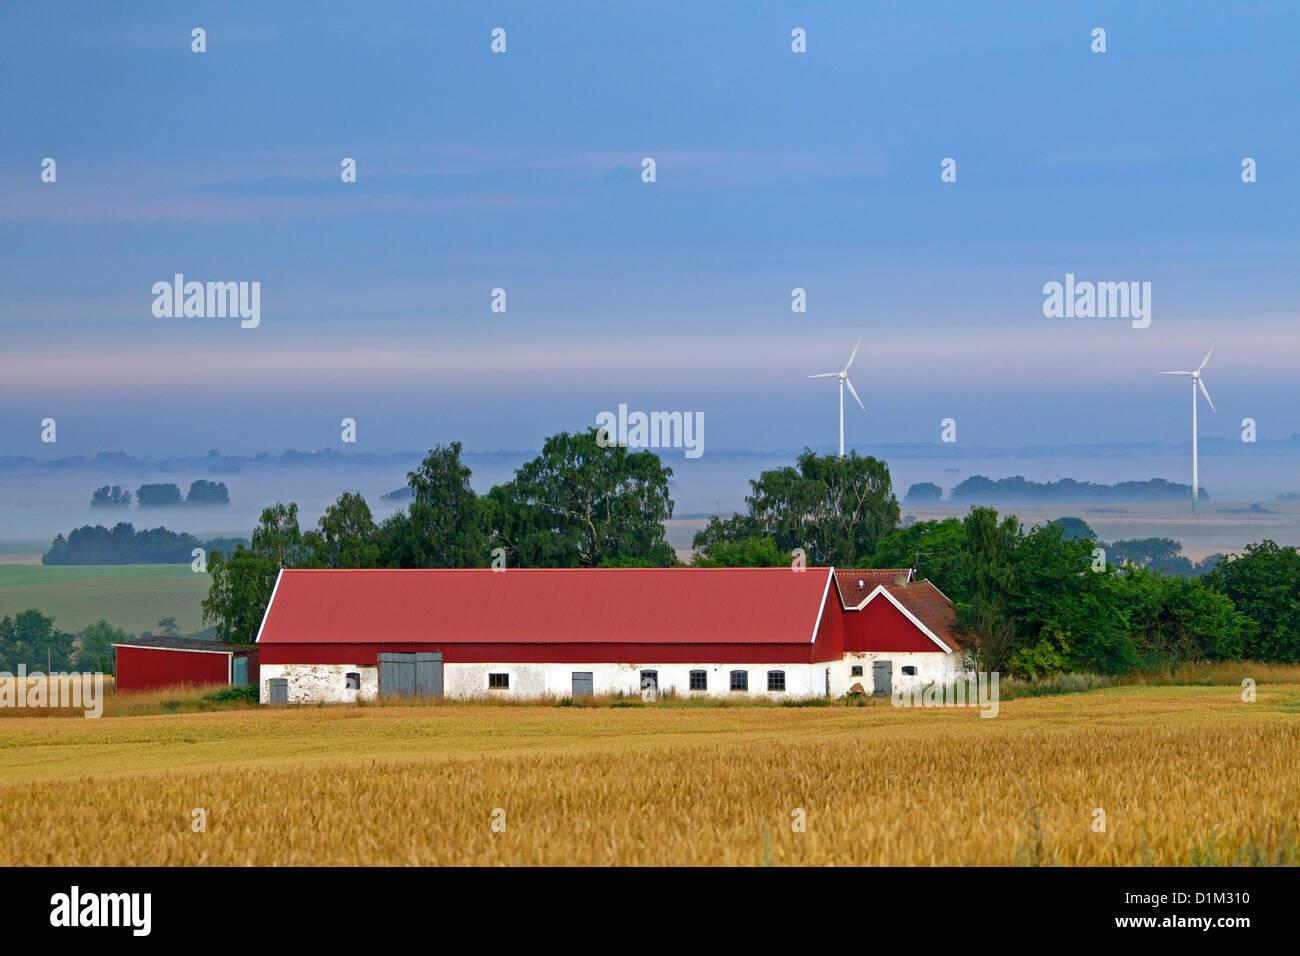 Wind turbines and red farm in wheat field, Skåne, Sweden, Scandinavia - Stock Image